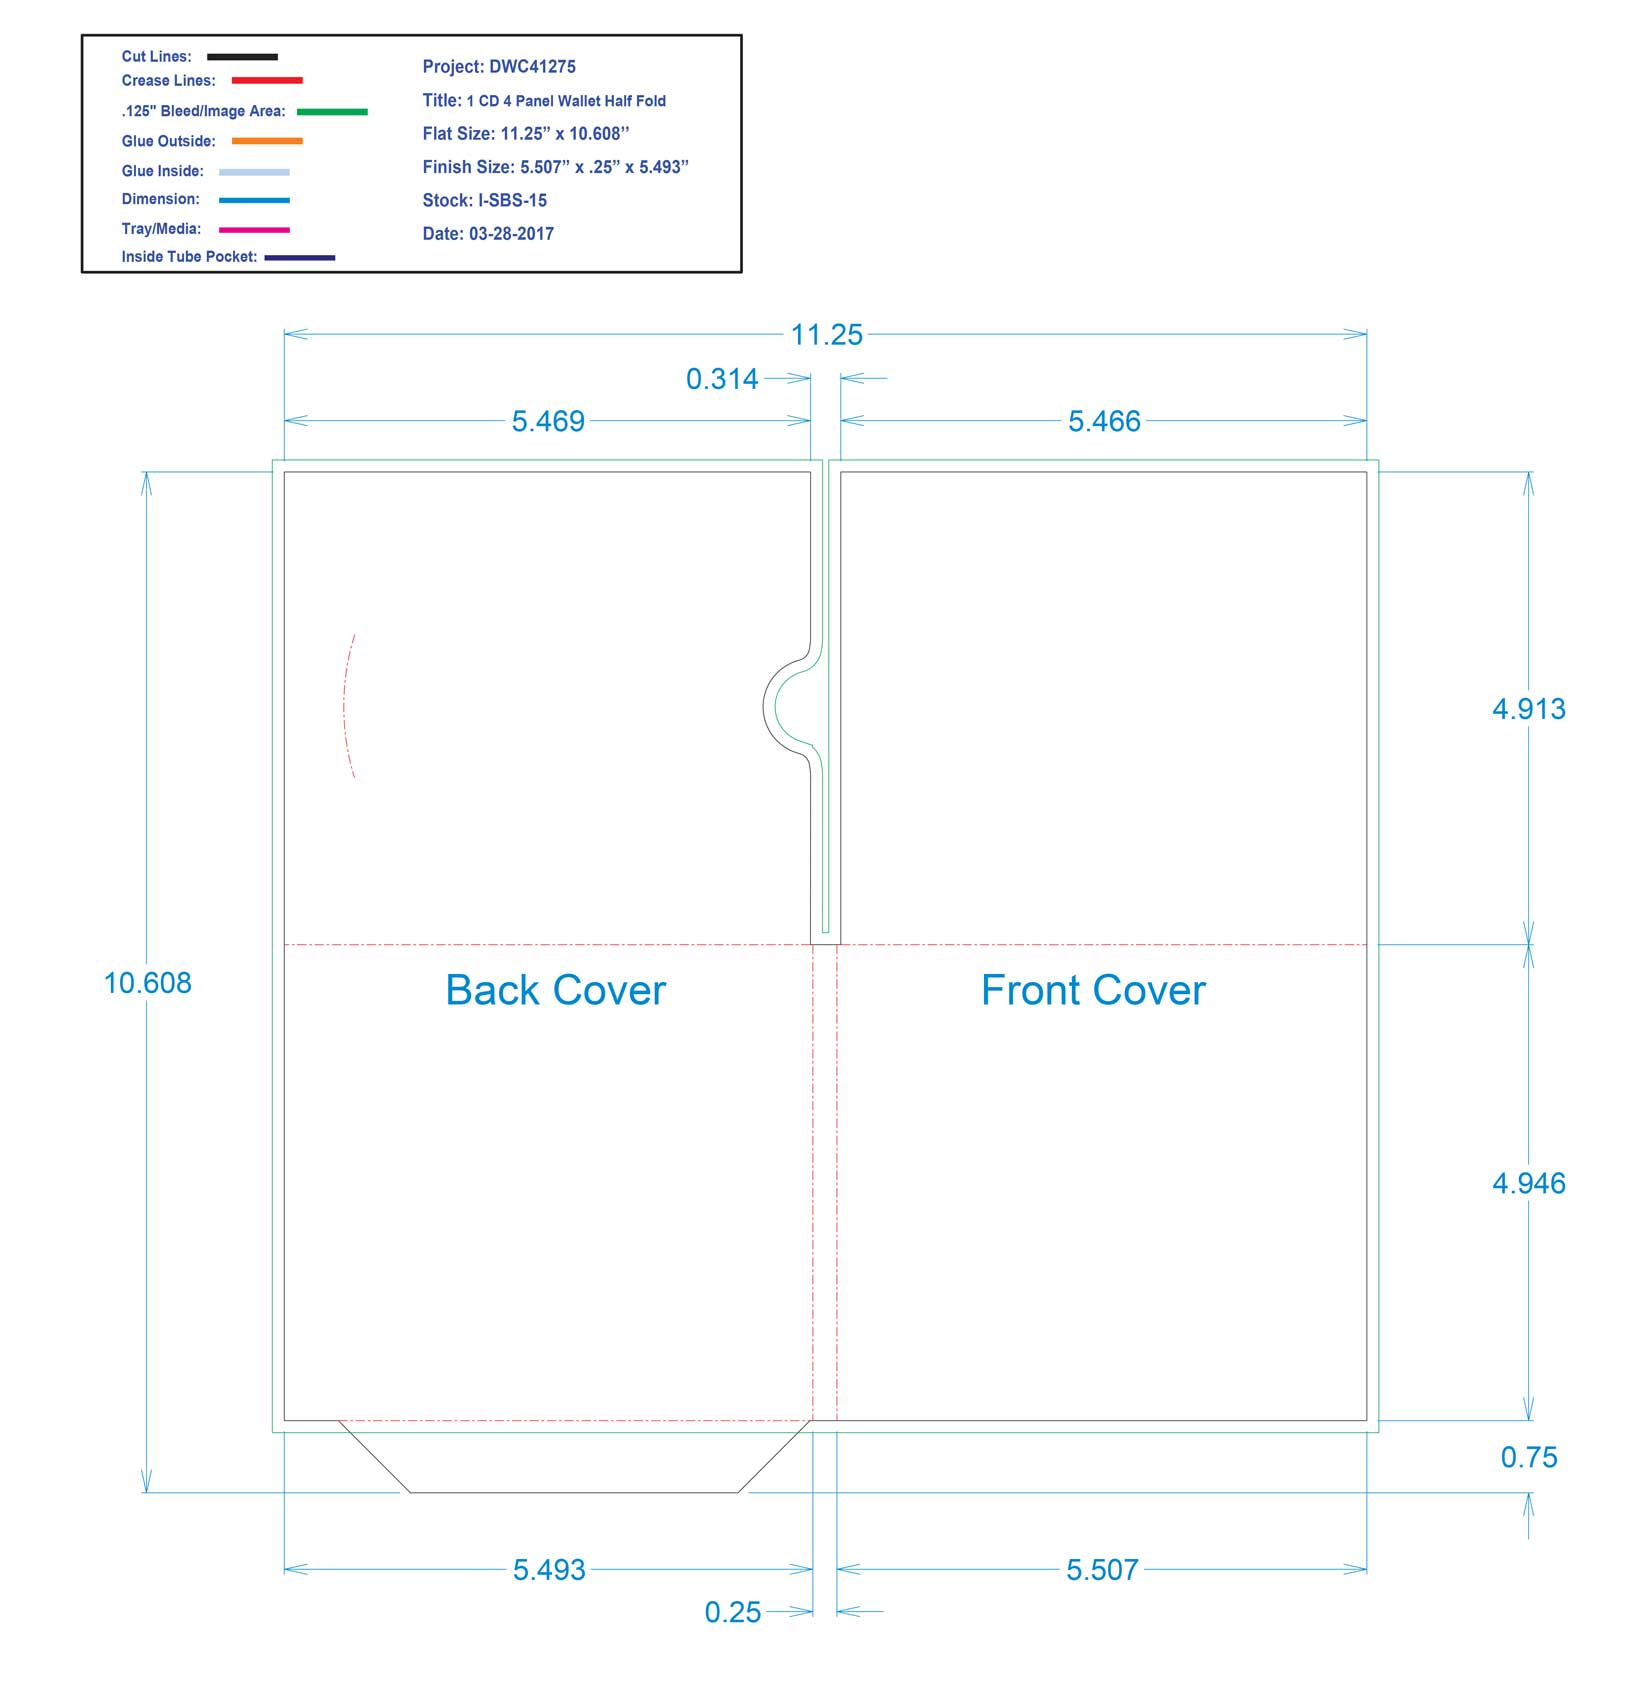 DWC41275-1 CD 4 PANEL WALLET HALF FOLD